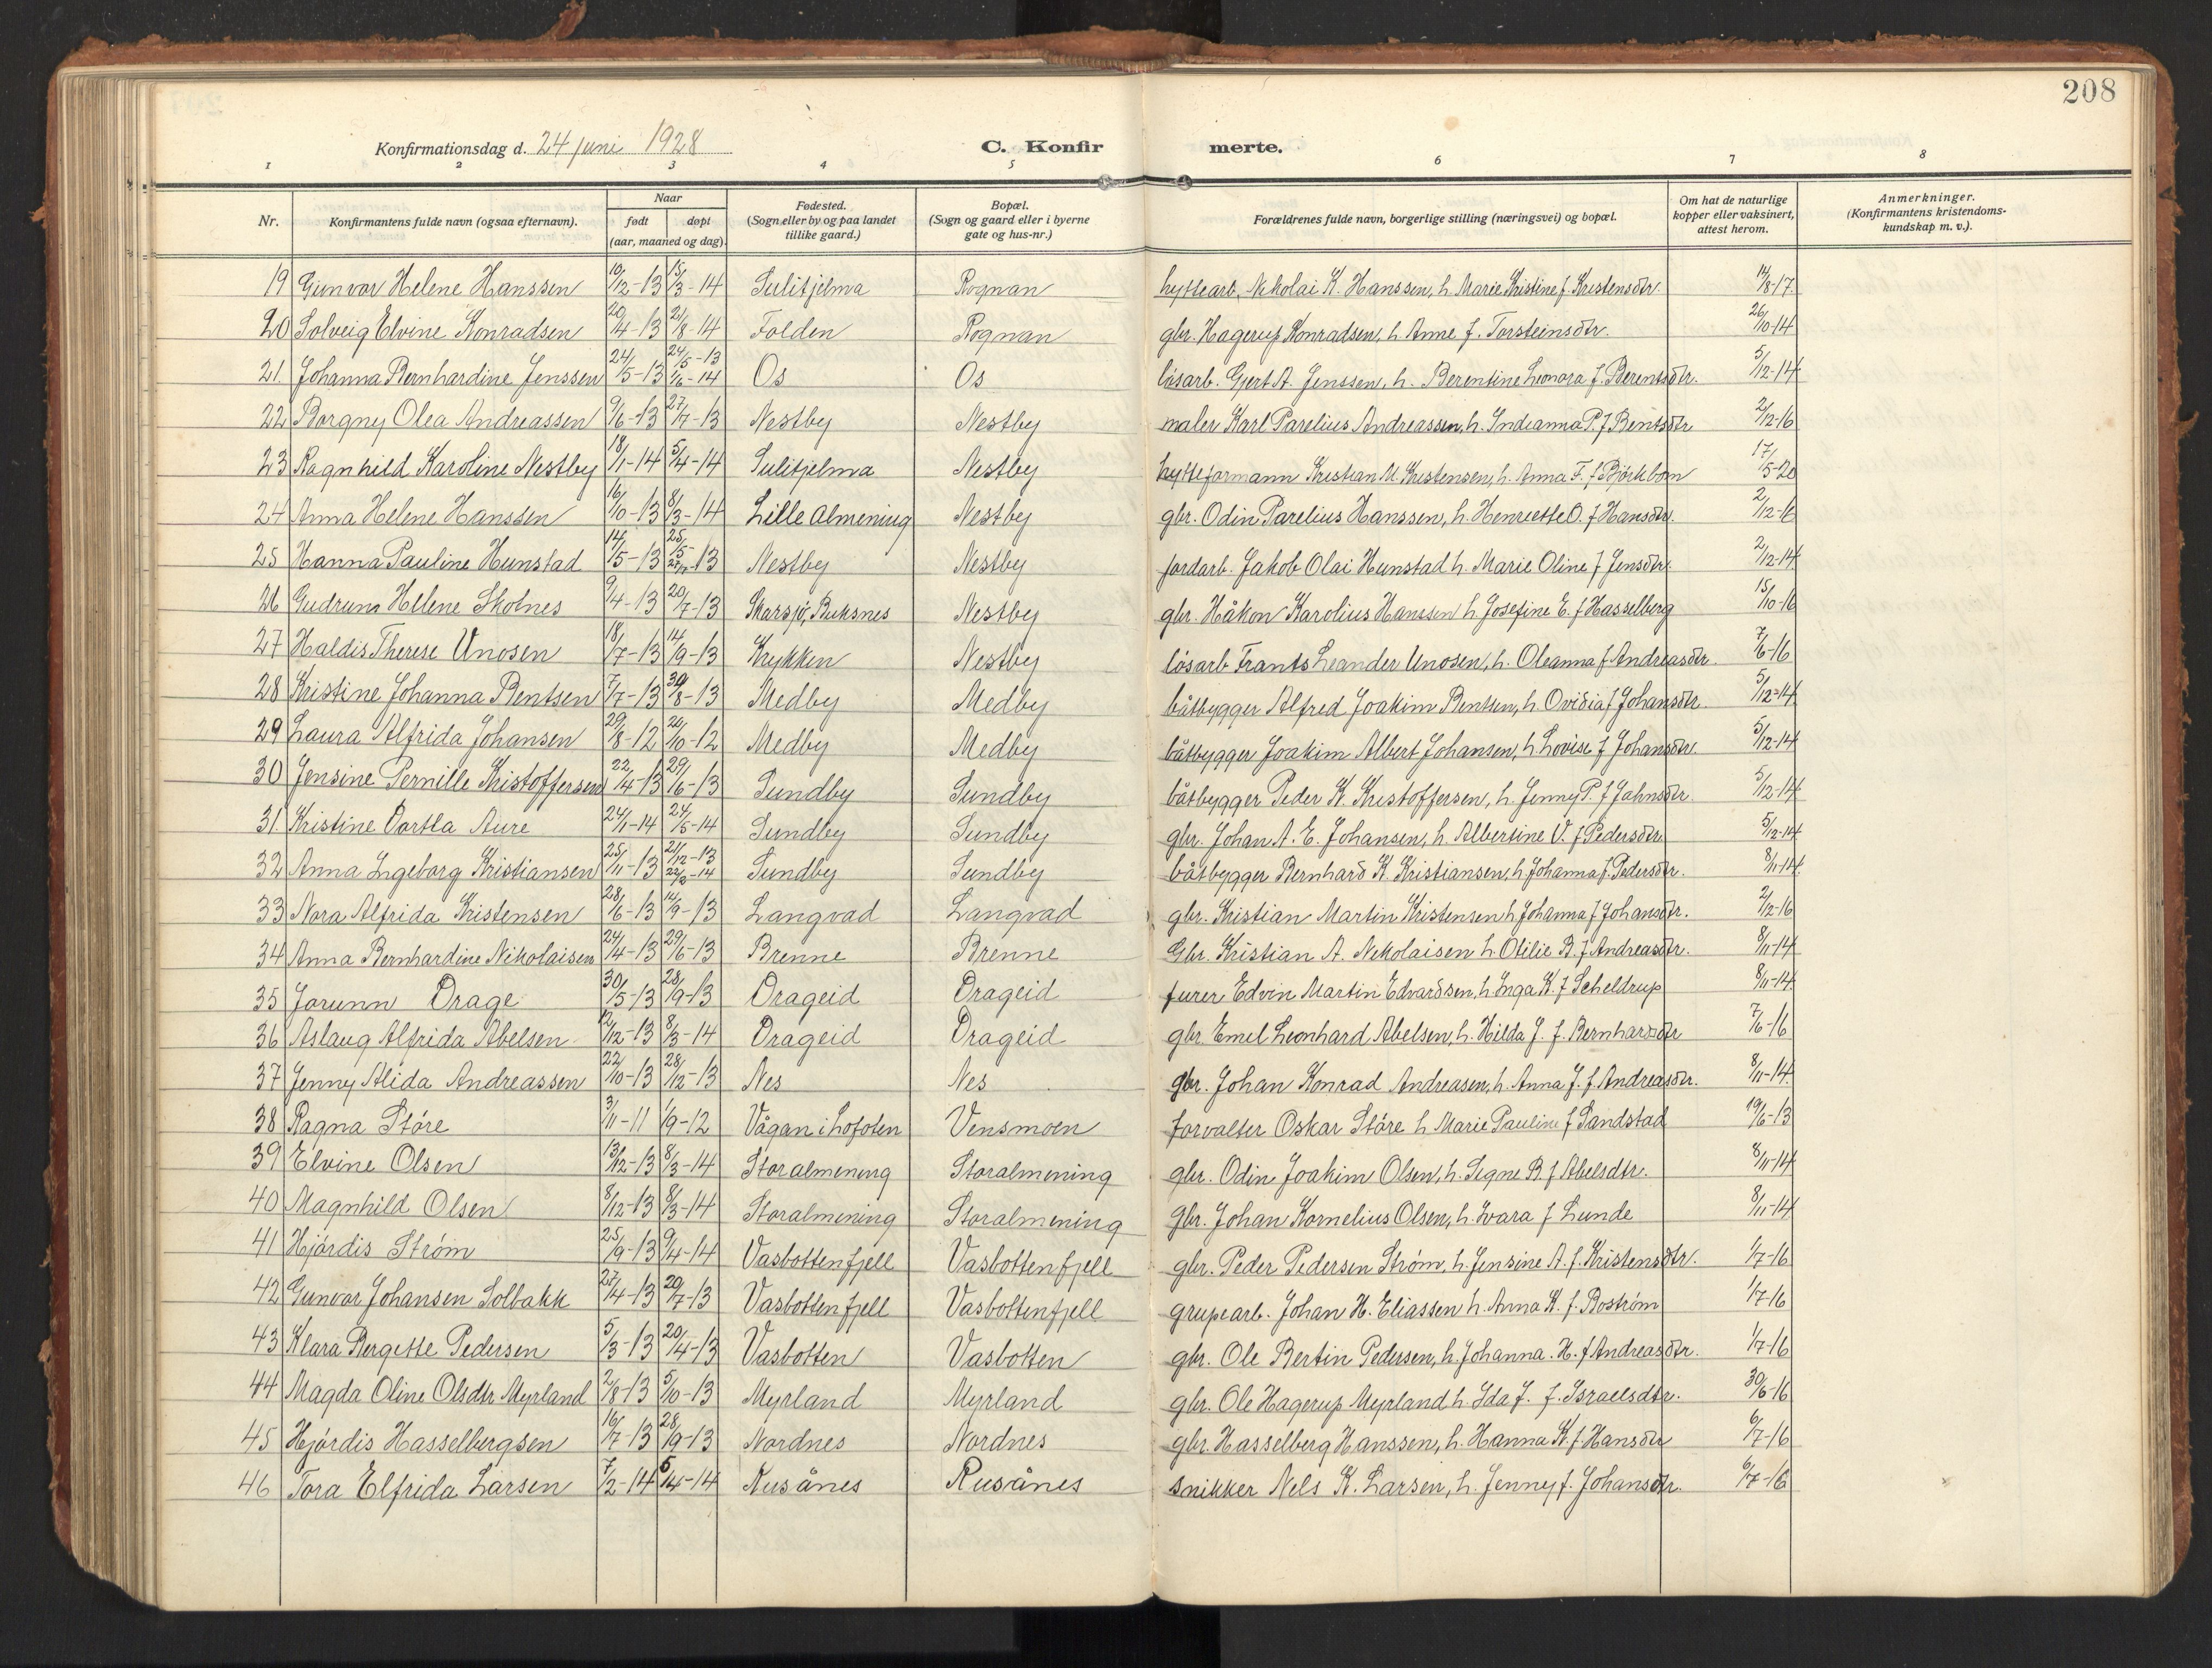 SAT, Ministerialprotokoller, klokkerbøker og fødselsregistre - Nordland, 847/L0683: Klokkerbok nr. 847C11, 1908-1929, s. 208